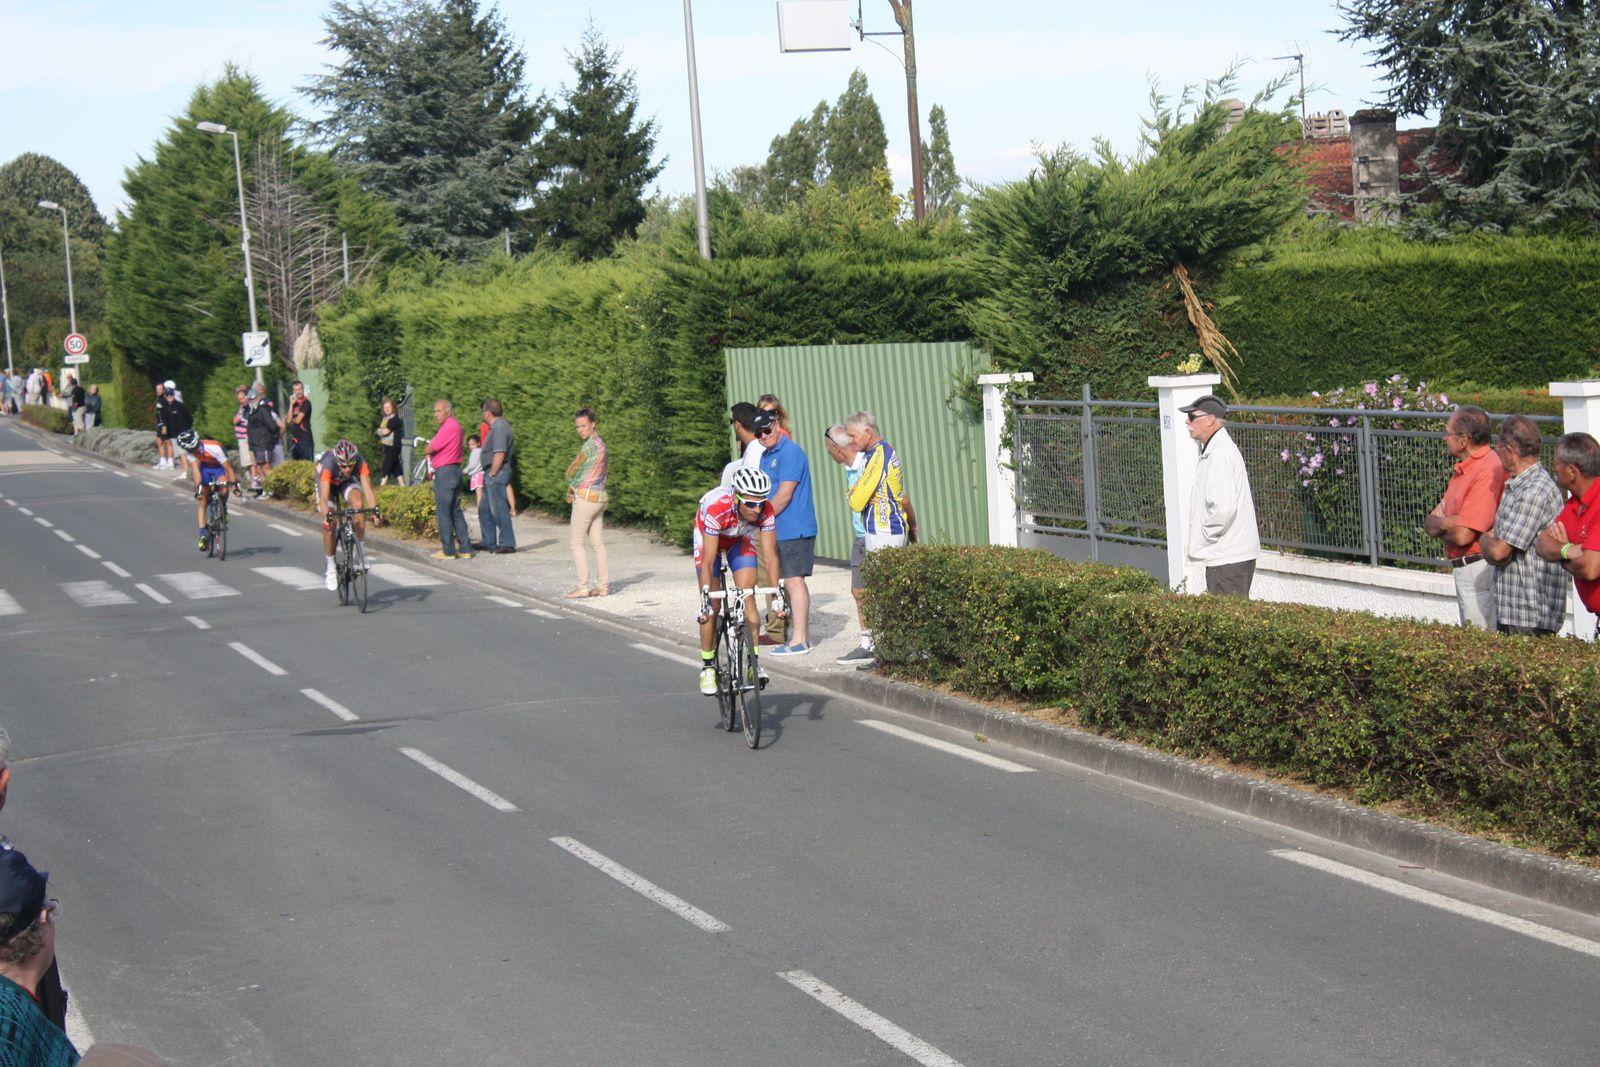 2e  Romain  MONCE(VC  Mérignac), 3e  Cyril  BASTIERE(VC  Pays de Langon), 4e  Eric  LECOANET(AC  Jarnac-Aigre-Rouillac), 5e  Mathieu  GIBAUD(UA La Rochefoucault), 6e  Nicolas  CRESPO(VC  Pays de langon), 7e  Valentin  PETITEAU(AC   Nersac), 8e  Christian  MONIER(C  Poitevin), 9e  Clément  MORICHON(G  croch), 10e  Cyrille  CHAMON(V  Naintré), 11e  Bertrand  CHAVANEL(UC  Cholet  49), 12e  Richard  BARIL(VC  Rochefort), 13e  Anthony  LUCAS(CA  Civray), 14e  Emmanuel  HERBRETEAU(AC  Jarnac-Aigre-Rouillac), 15e  Wielfrid  THIEBAUD(Tarbes C), 16e  Pierre  PAINAUD(G  St  Martinois), 17e  Thomas  VALENTIN(AC  Jarnac-Aigre-Rouillac), 18e  Jean-Patrick  TISSEAU(VC  Chantonnay), 19e  Olivier  BOSSIS(Angouléme  VC), 20e  Yannis  PERROCHEAU(VC  Herbretais), 21e  Jean-Claude  SOULARD(TC  Chateaubernard), 22e  Thibaut  BLANCHARD(VC  Saintes), 23e  Kévin  BERTRAND(ACBB)